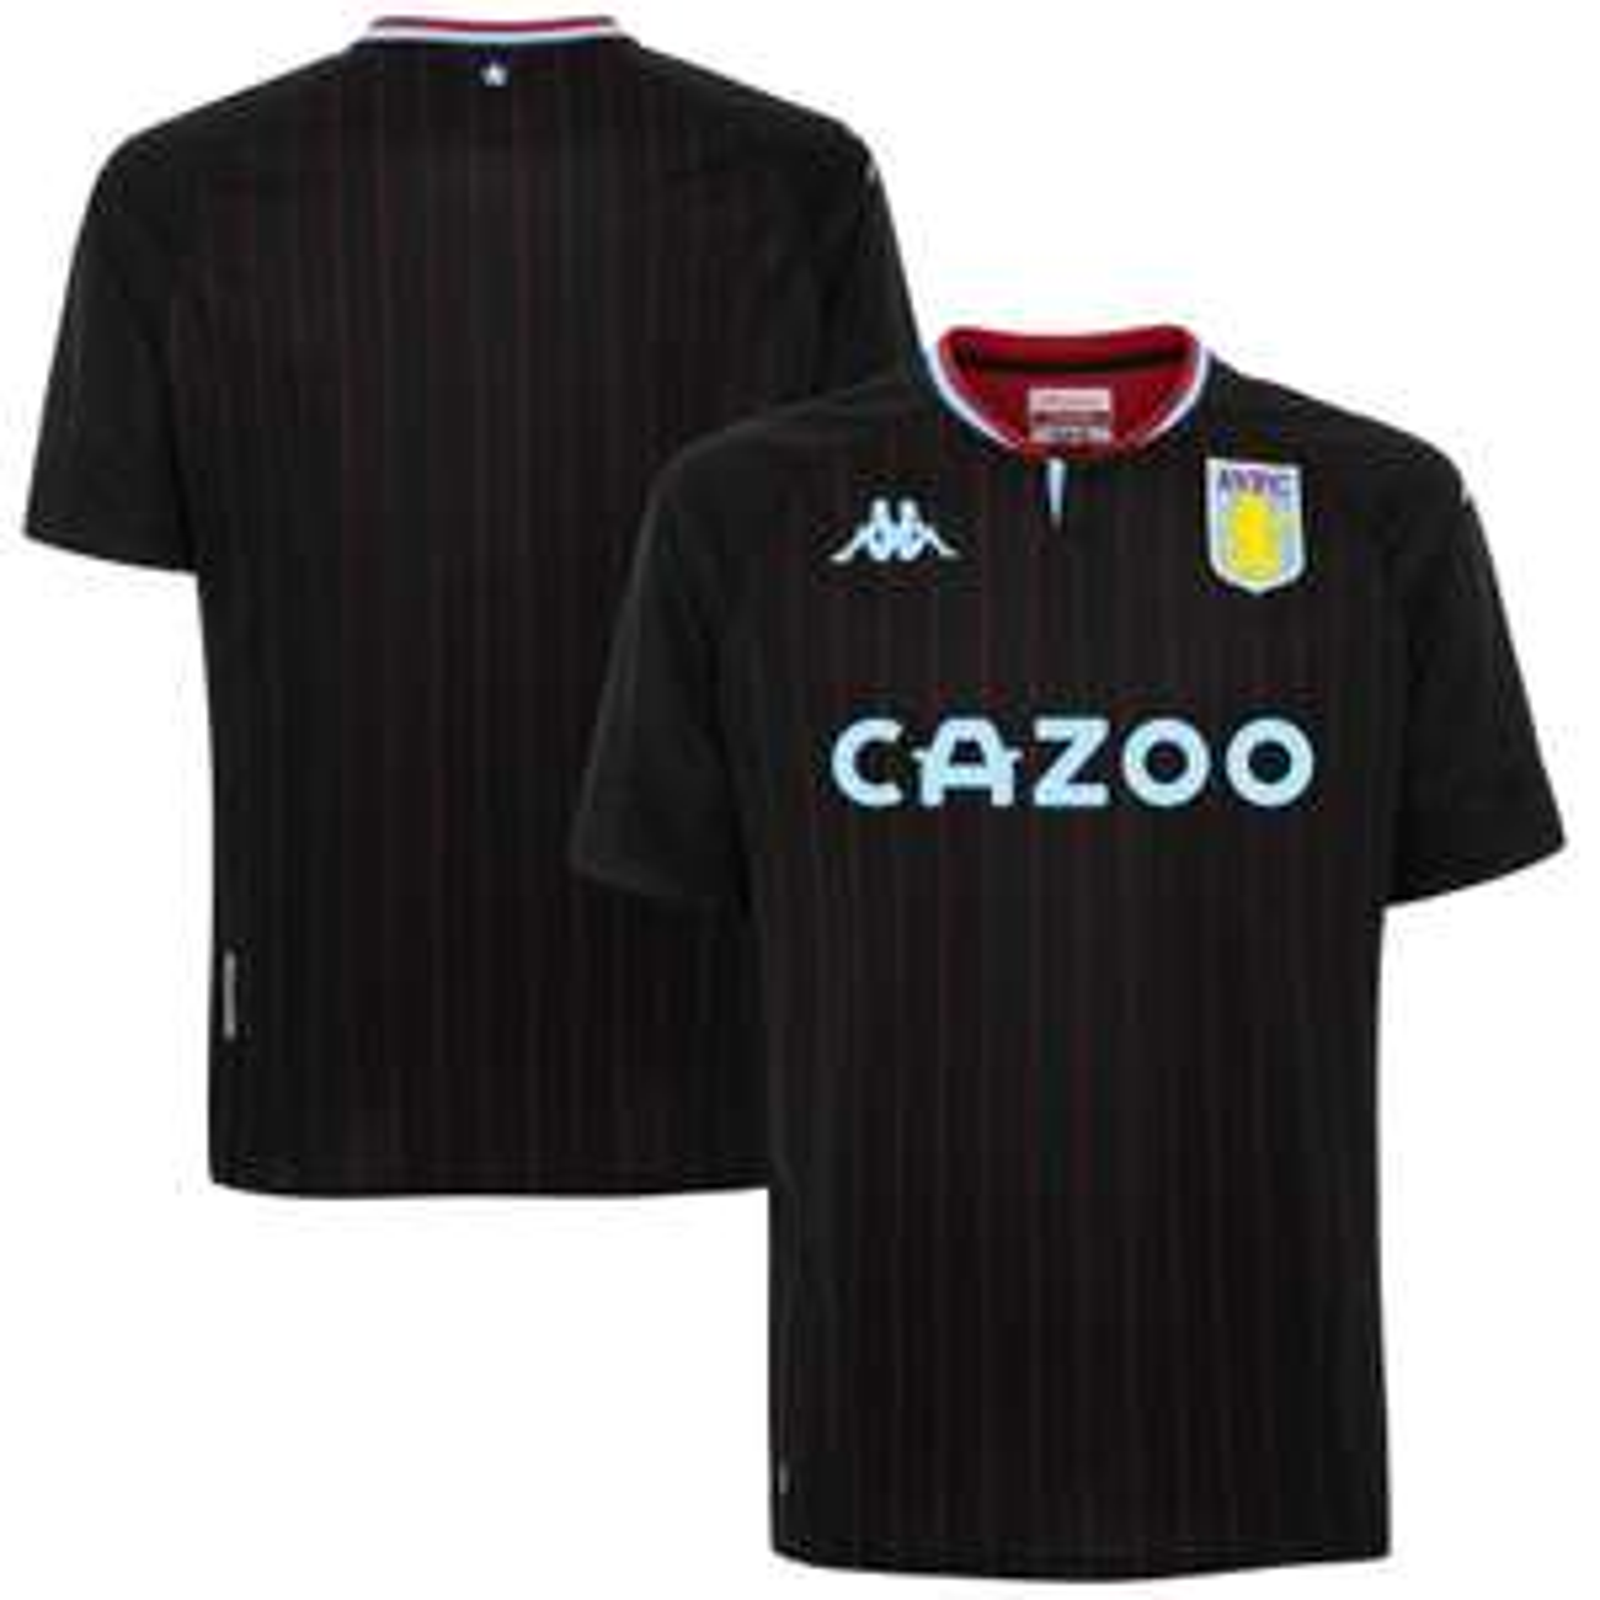 Aston Villa 2020/21 away shirt - £22.92 @ kitbagstore Ebay